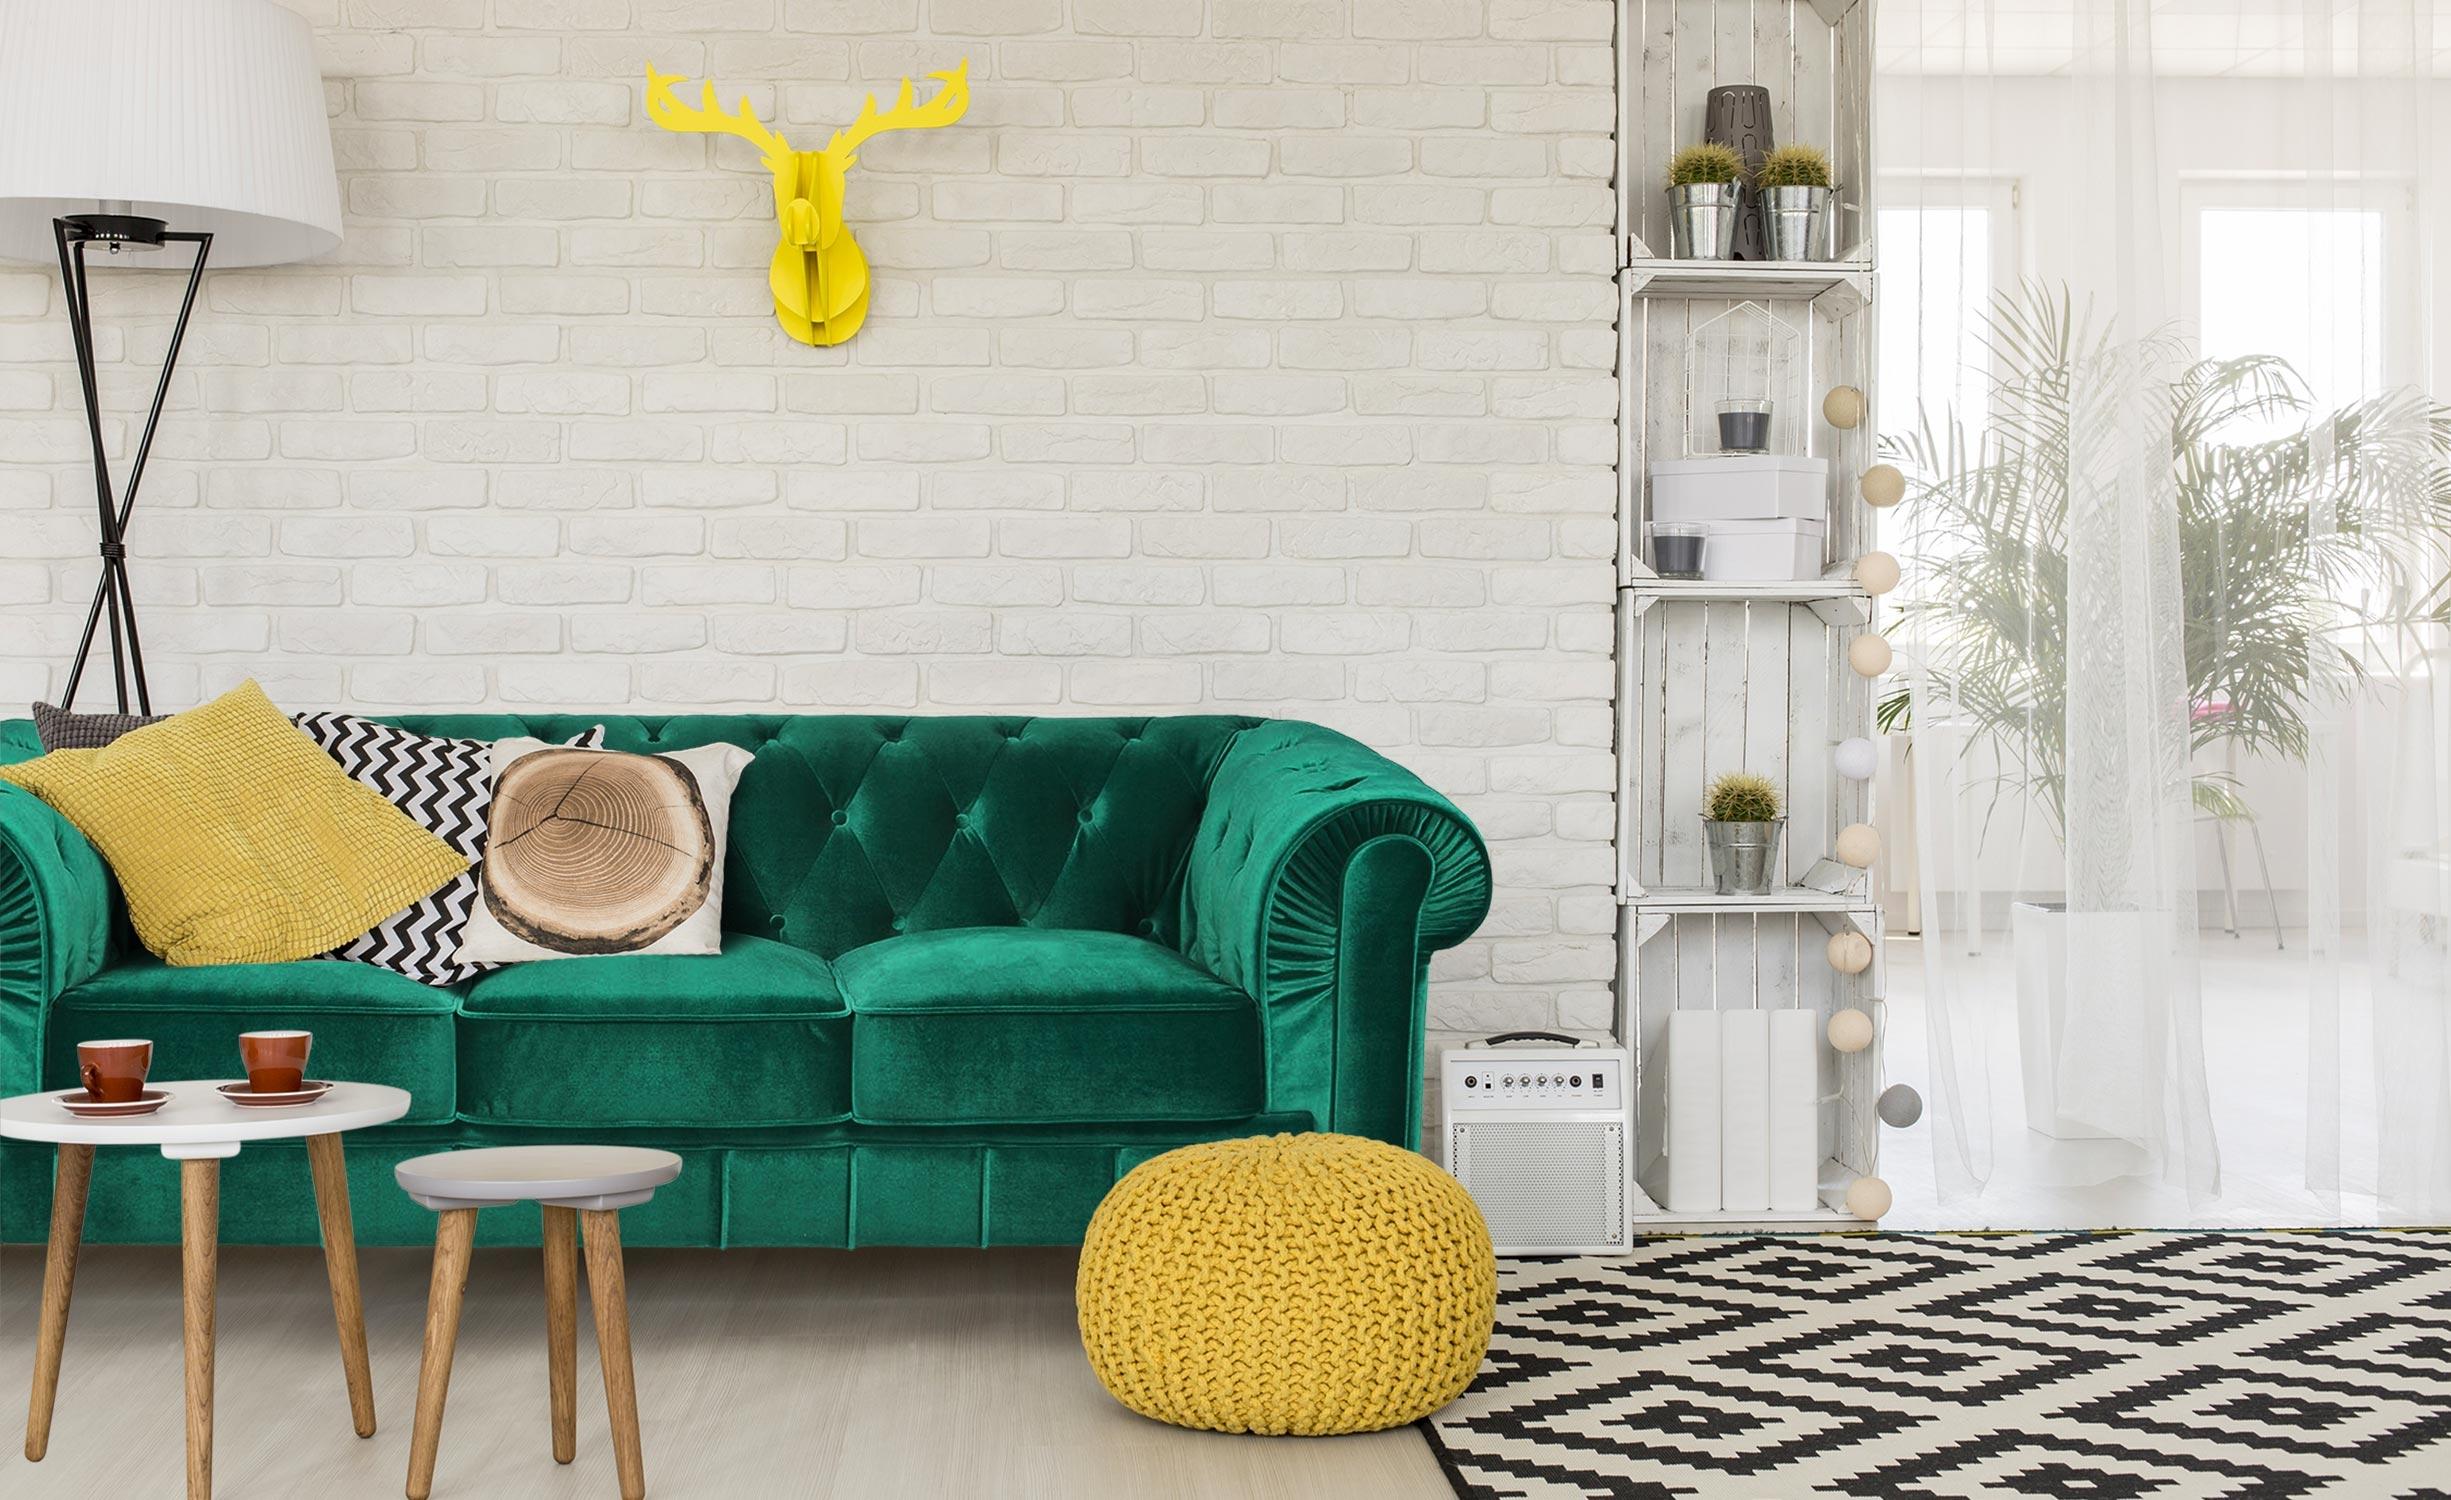 Grand Canapé Chesterfield 3-Sitzer Sofa mit Samtbezug Grün